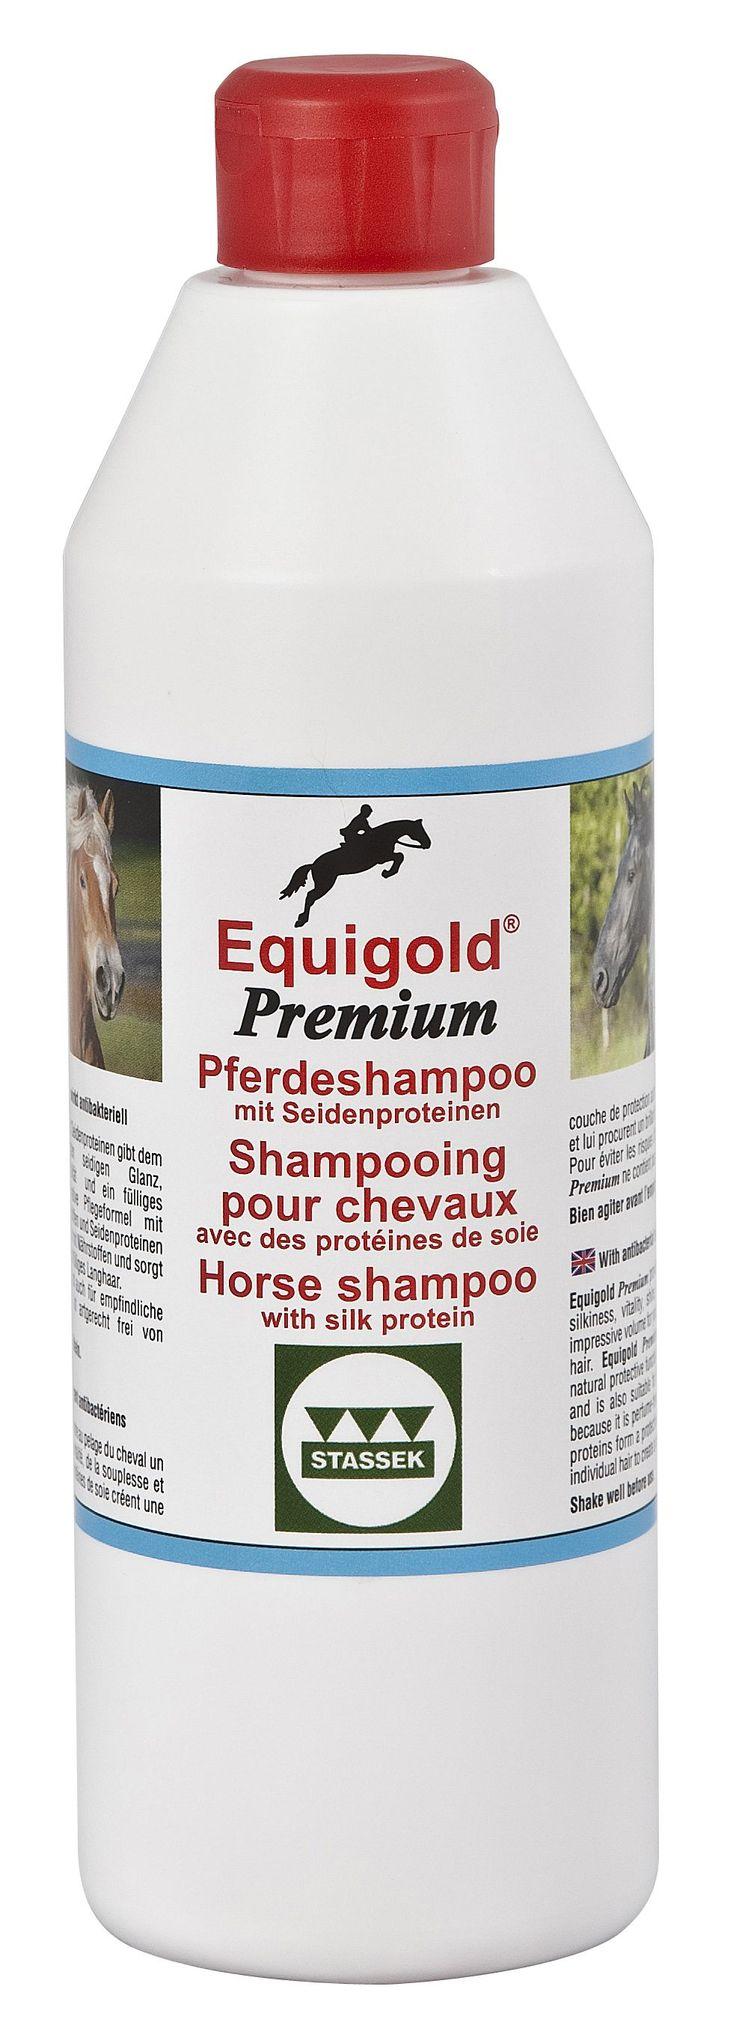 Stassek Equigold Premium Luxus-Pferdeshampoo mit Seidenproteinen, artgerecht parfumfrei, mehr auf www.stassek.com --  Stassek Equigold Premium luxury horse shampoo with silk proteins, species-appropriate without annoying scents, see www.stassek.com --  Stassek Equigold Premium shampoing luxurieux avec des protéïnes de soie pour chevaux, sans parfum fâcheux, voir www.stassek.com